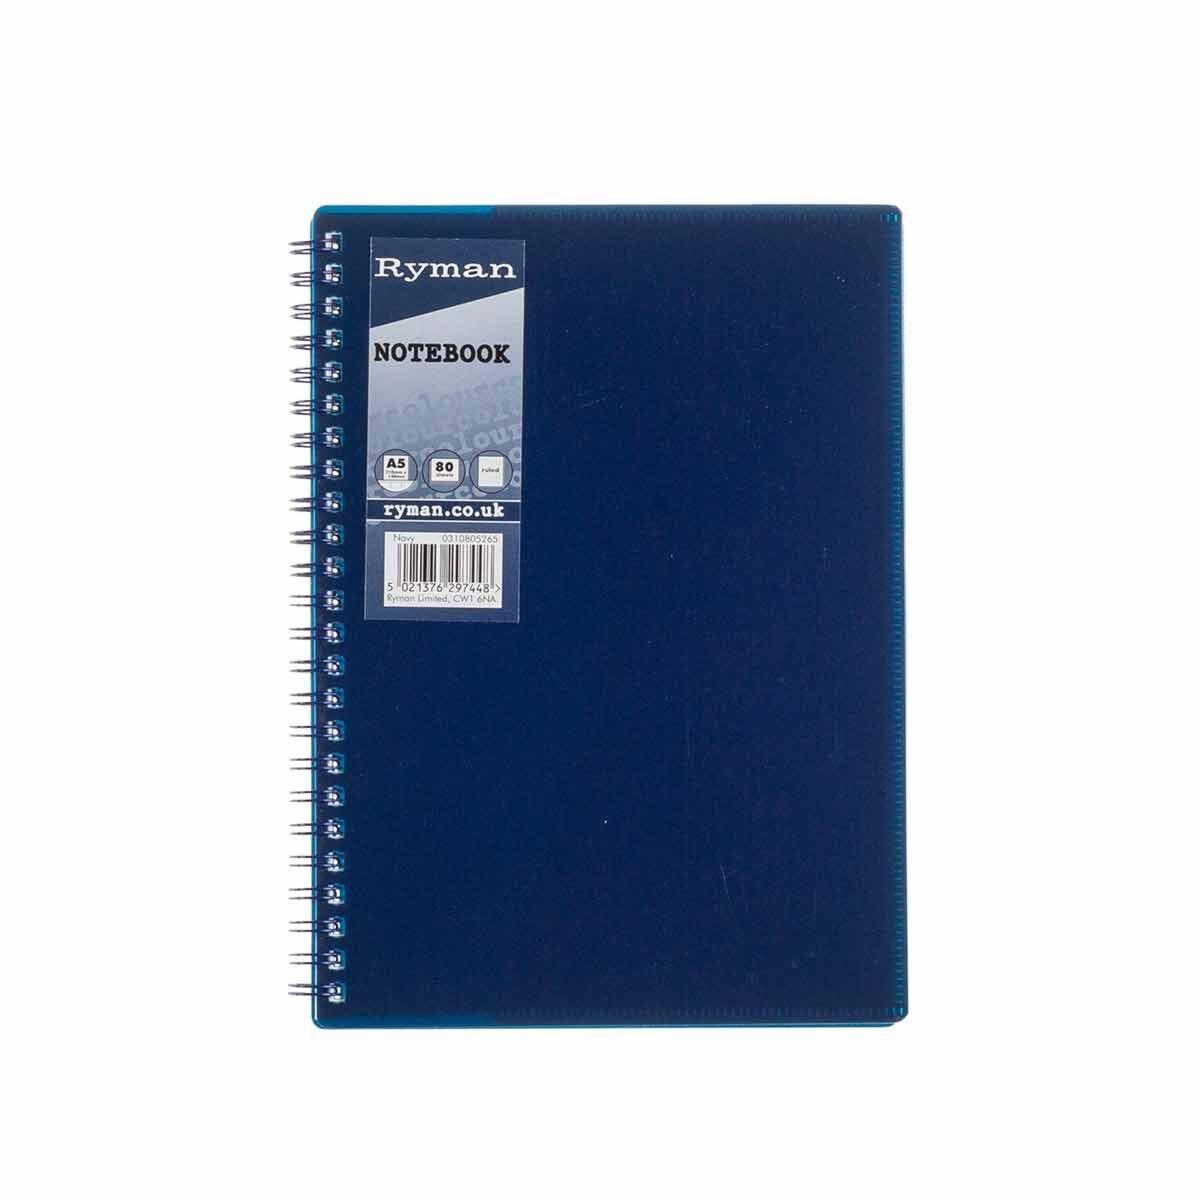 Ryman Pastel Notebook Ruled A5 Navy